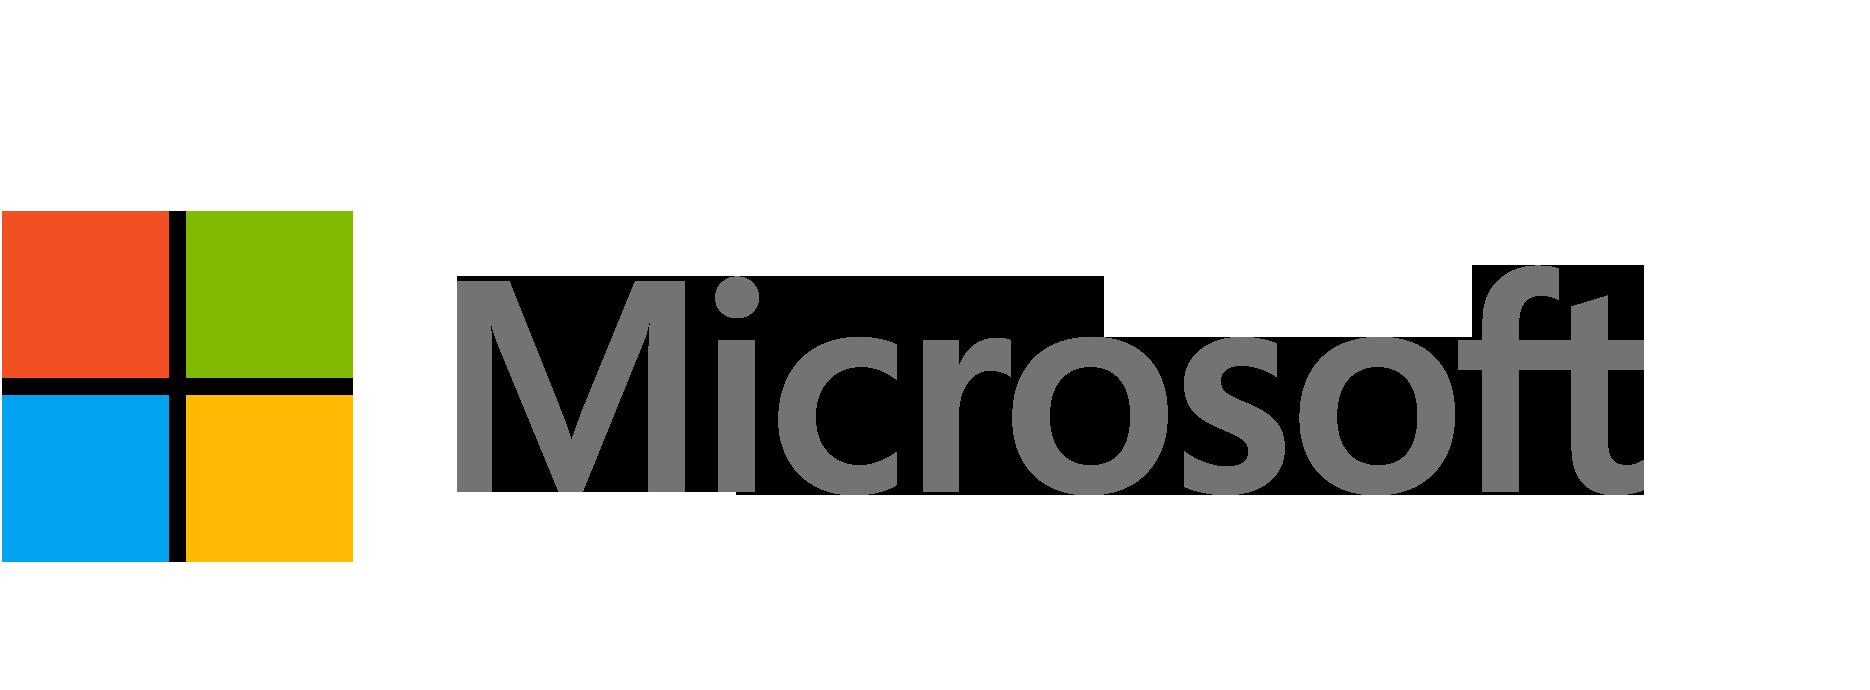 microsoft logo png banff venture forum